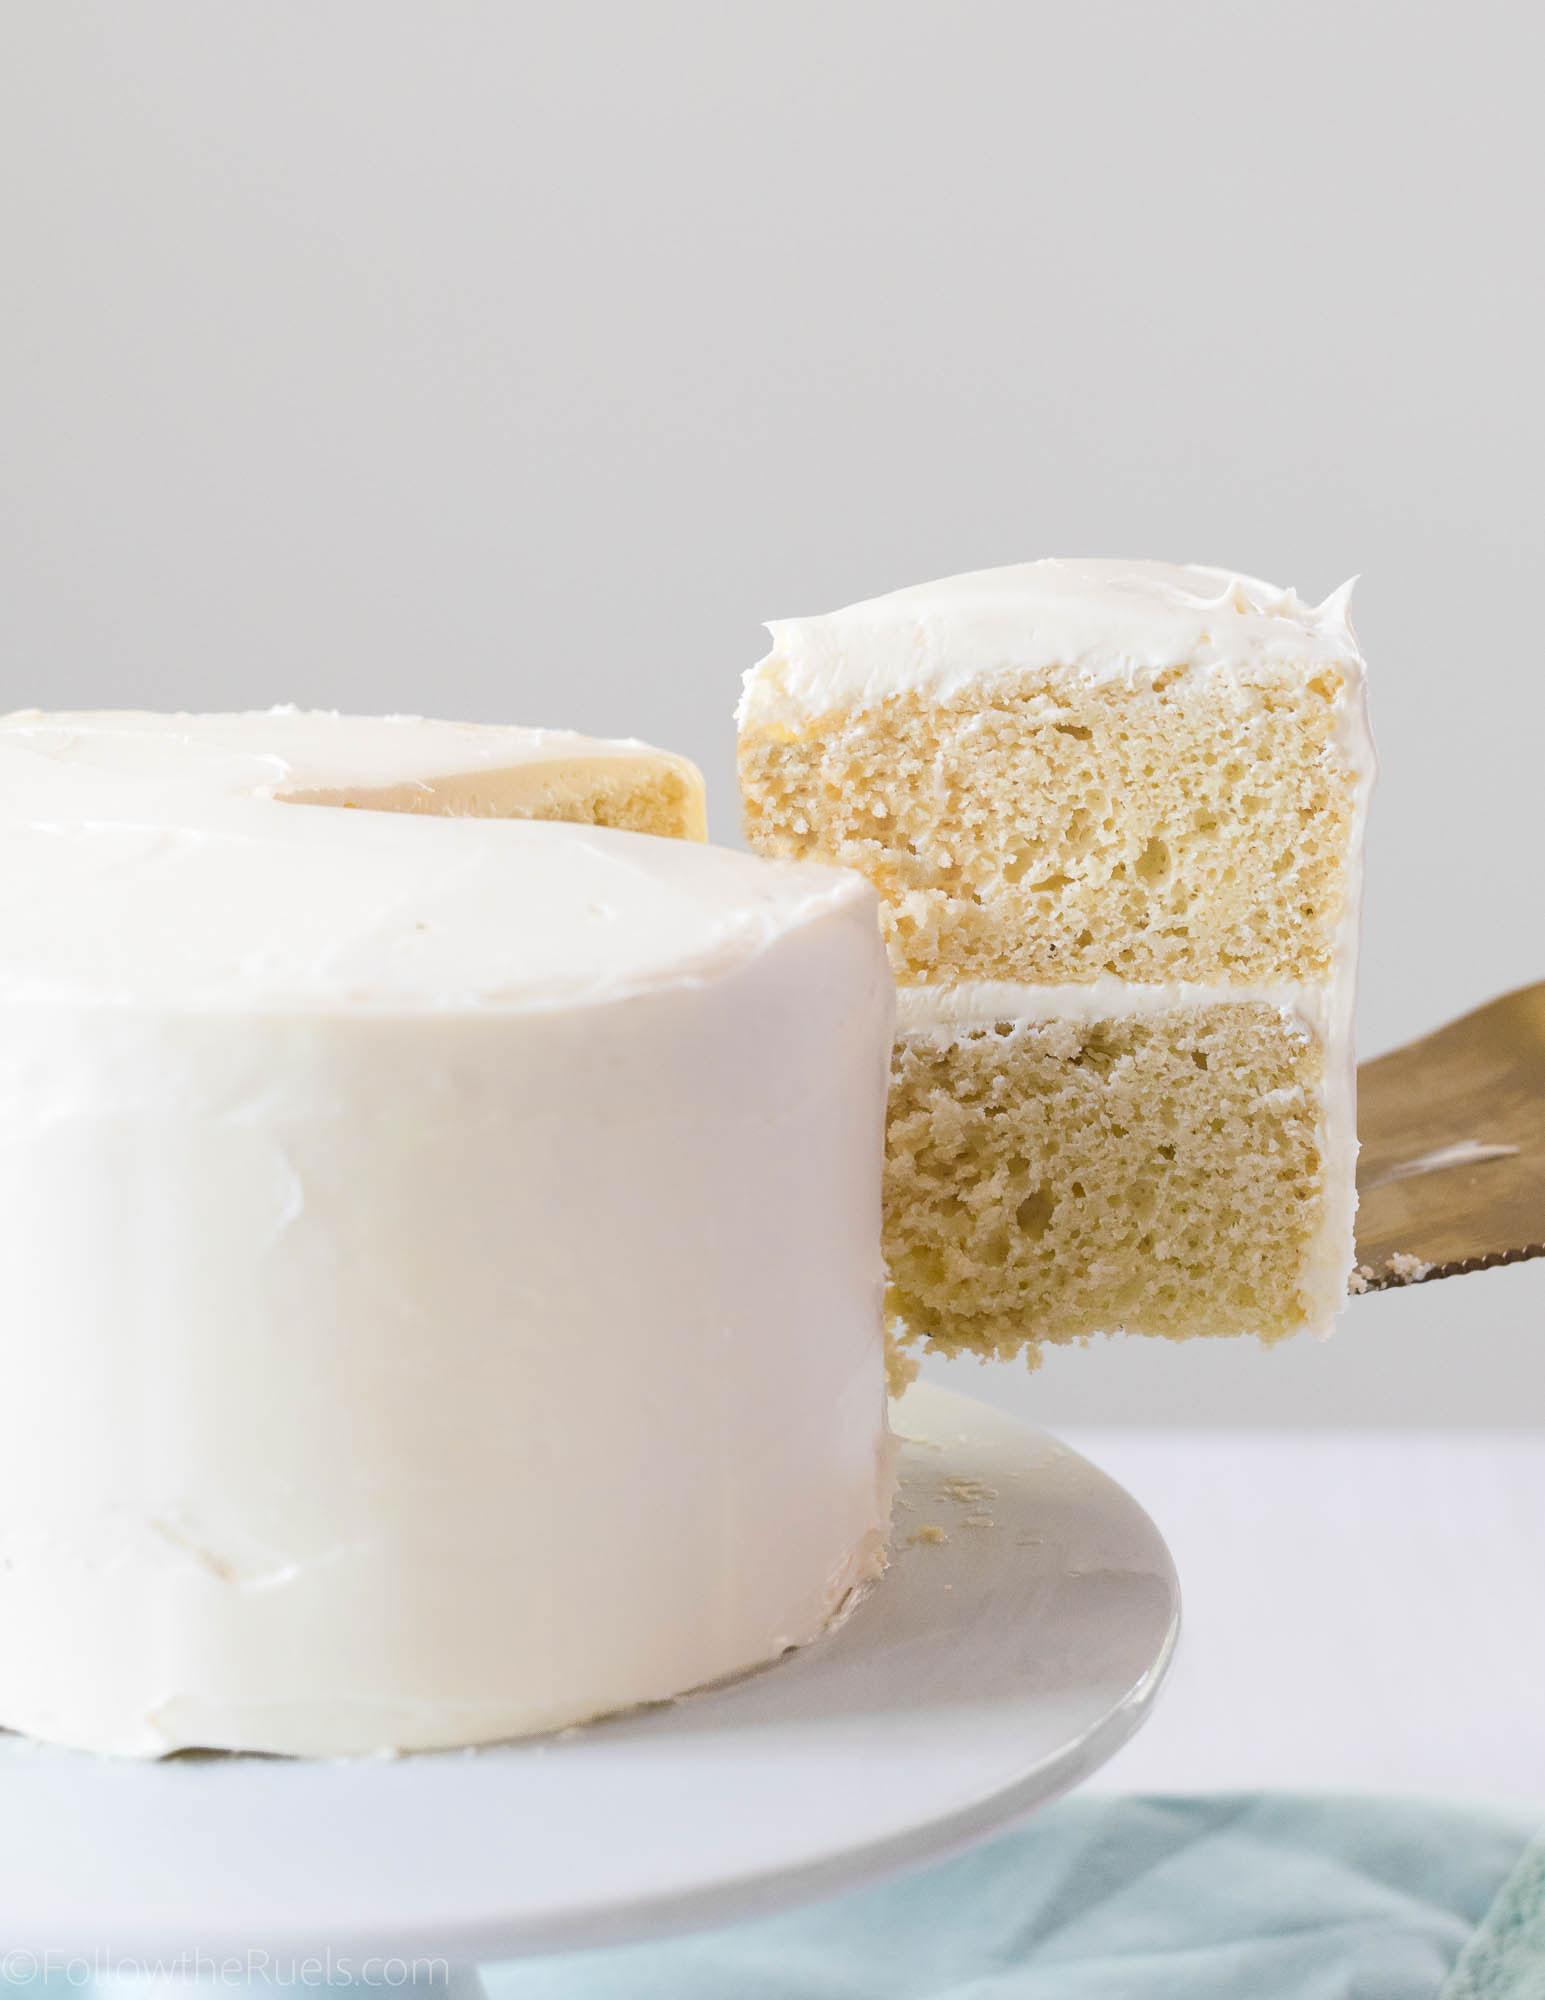 How To Make Boxed Cake Mix Taste Homemade Honey Blonde